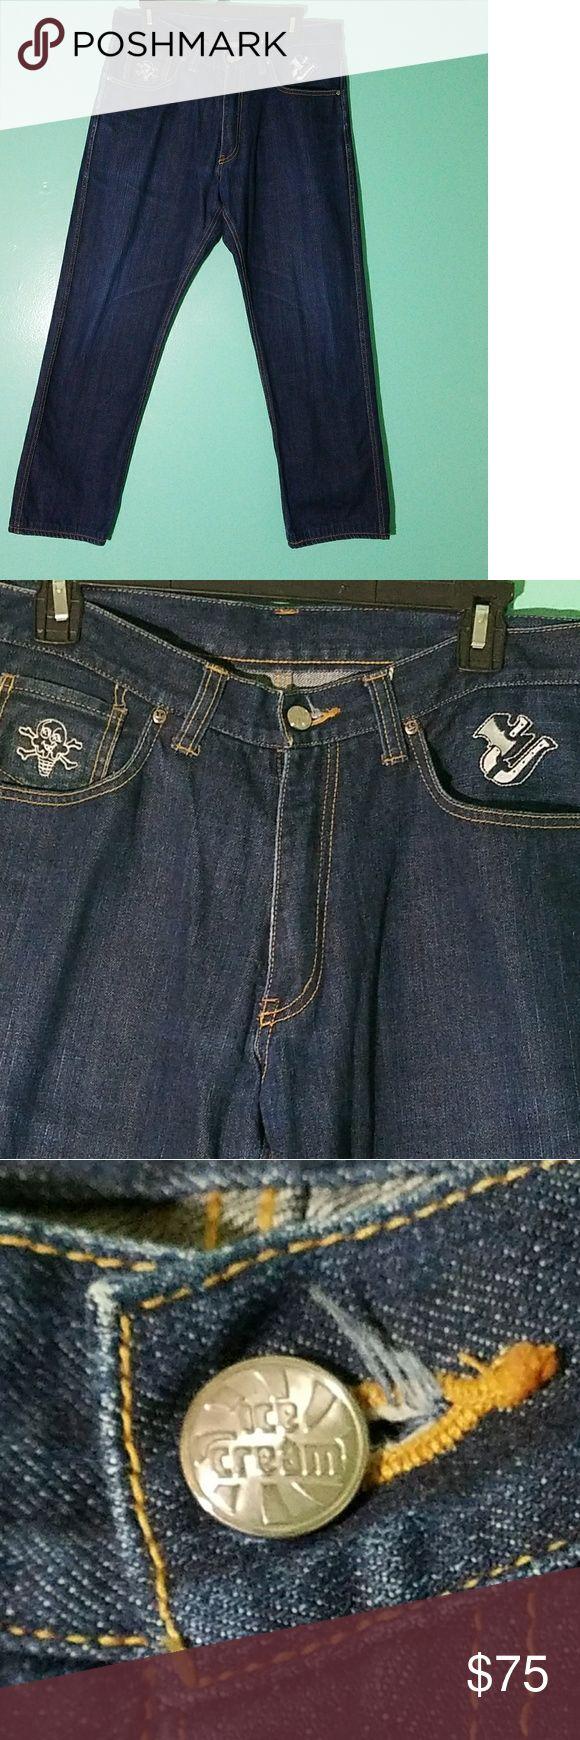 Icecream Jeans. Billionaire Boys Club 34x28 Billionaire Boys Club Icecream Jeans  100% Cotton  34waist ? 28 inseam Not a single flaw look brand new feel brand new Billionaire Boys Club Jeans